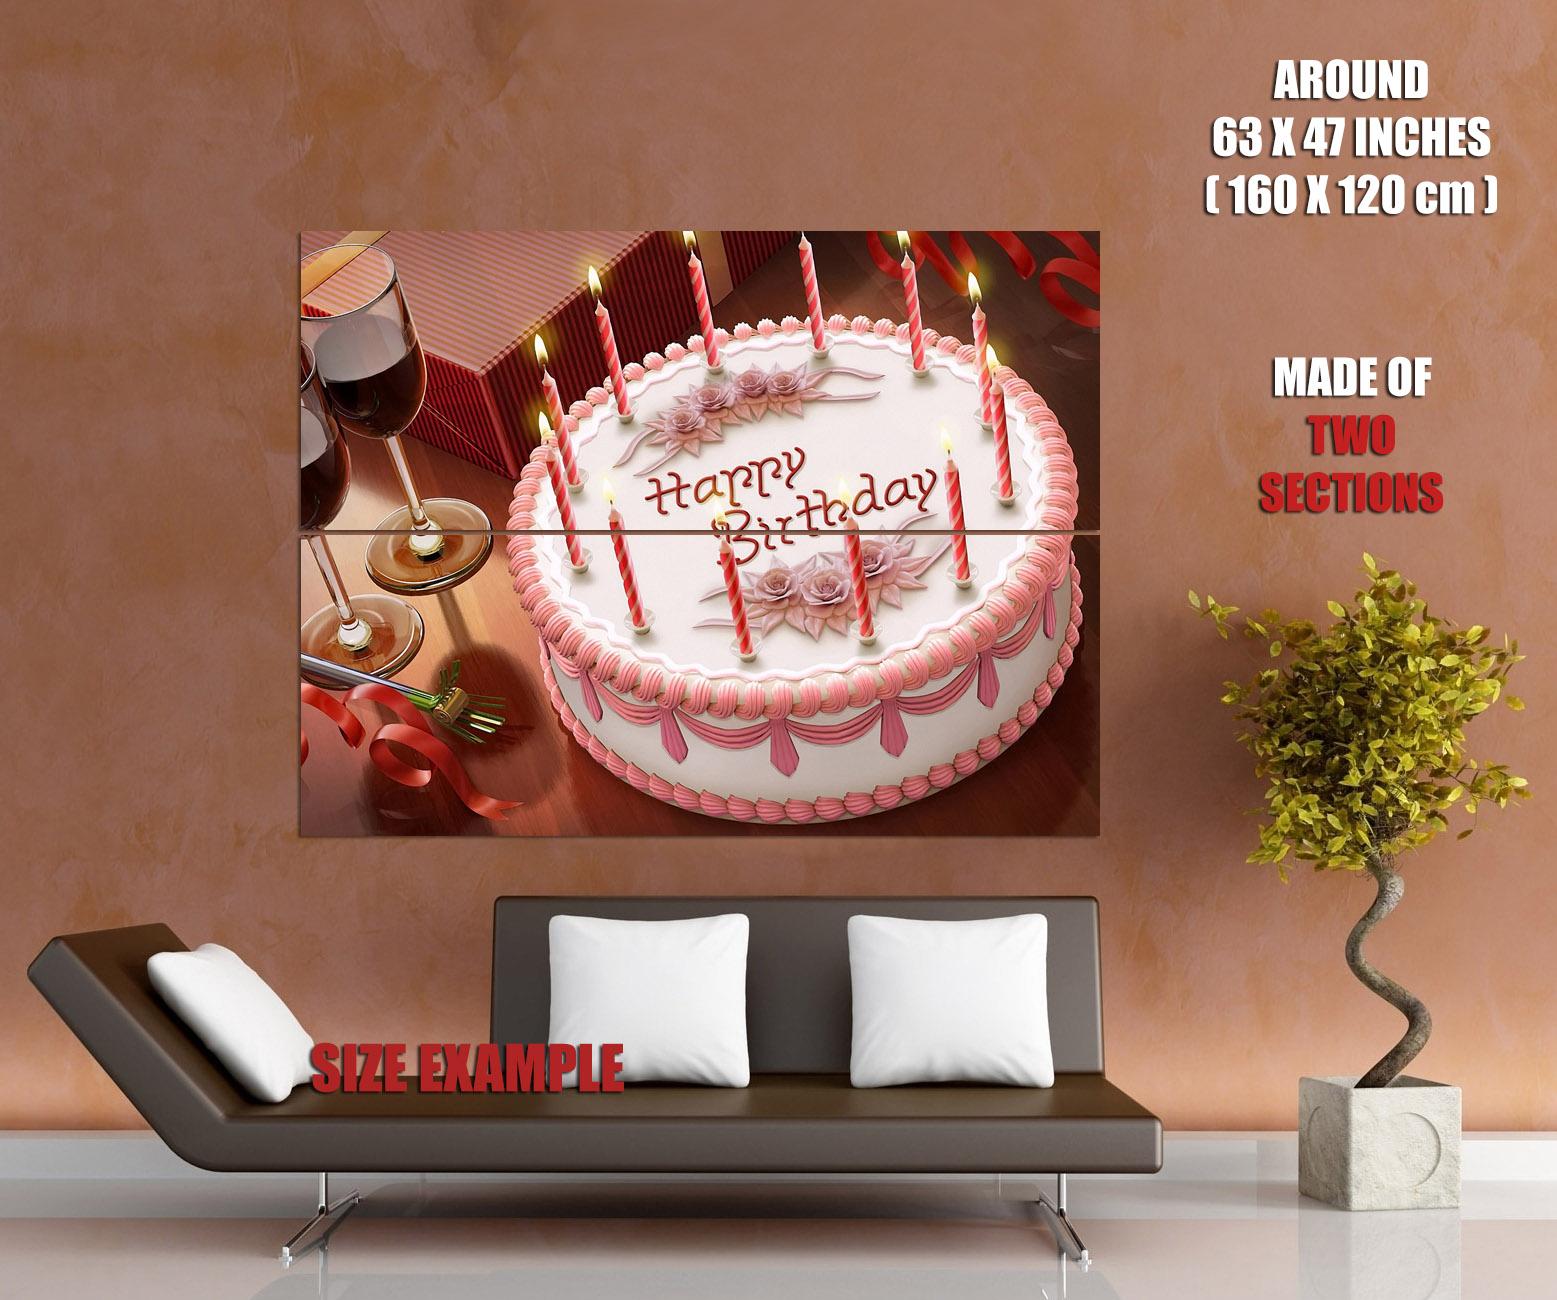 Happy Birthday Cake Candles Holiday Triumph Wall Print